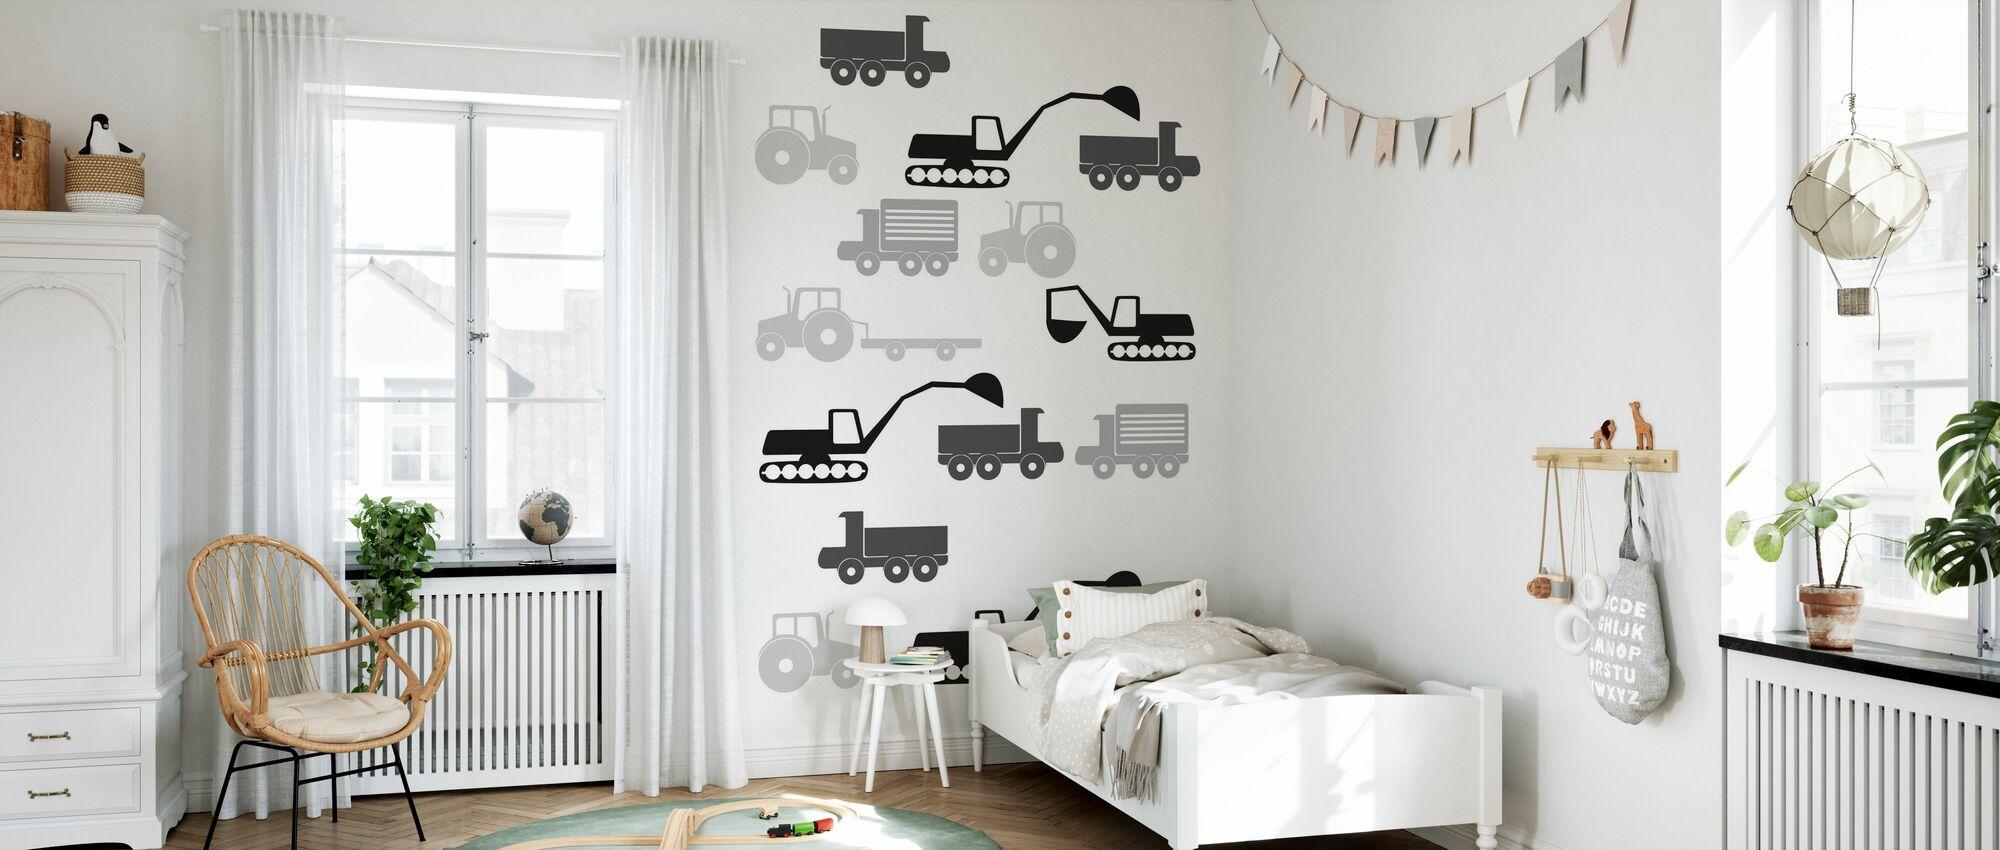 Heavy Vehicles - Bw - Wallpaper - Kids Room